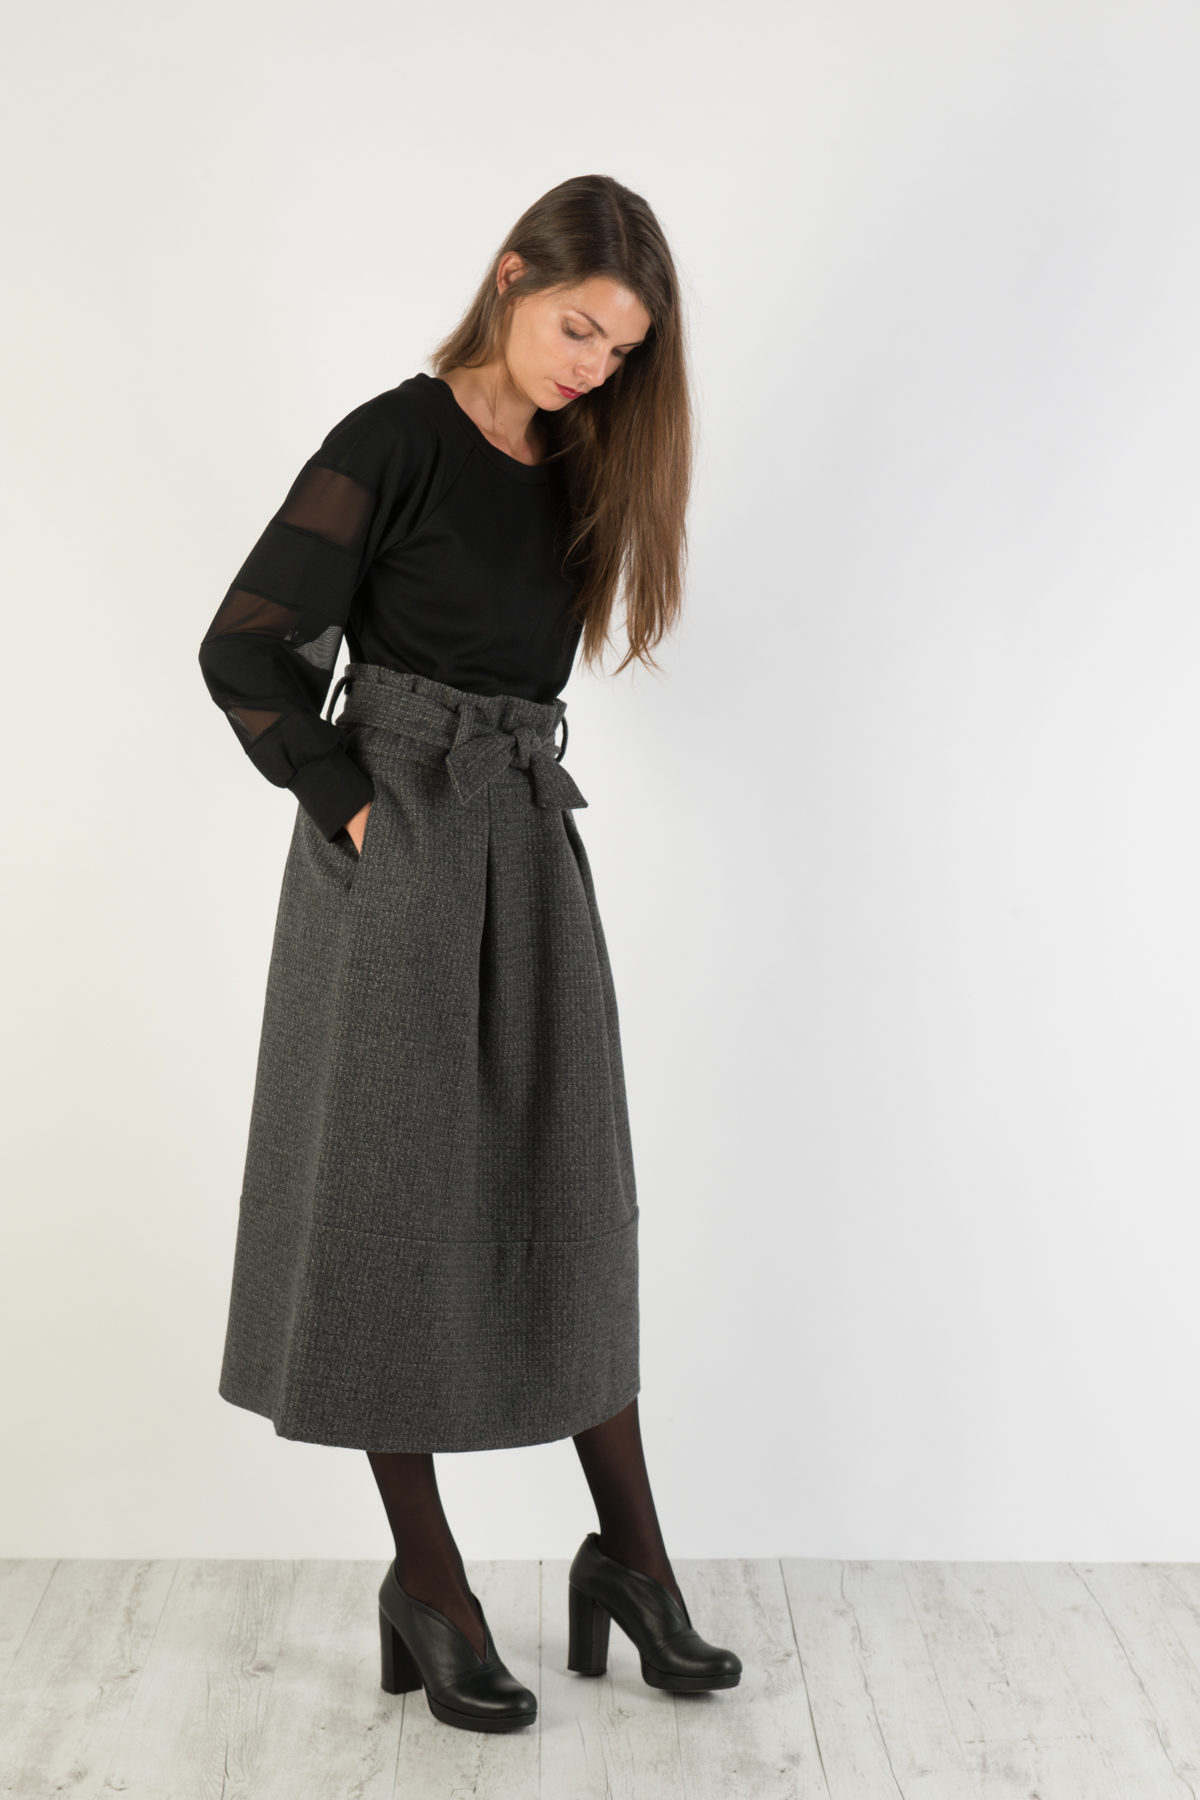 dettagliare 49102 b475c High waisted skirt Florie gonna con maxi pinces